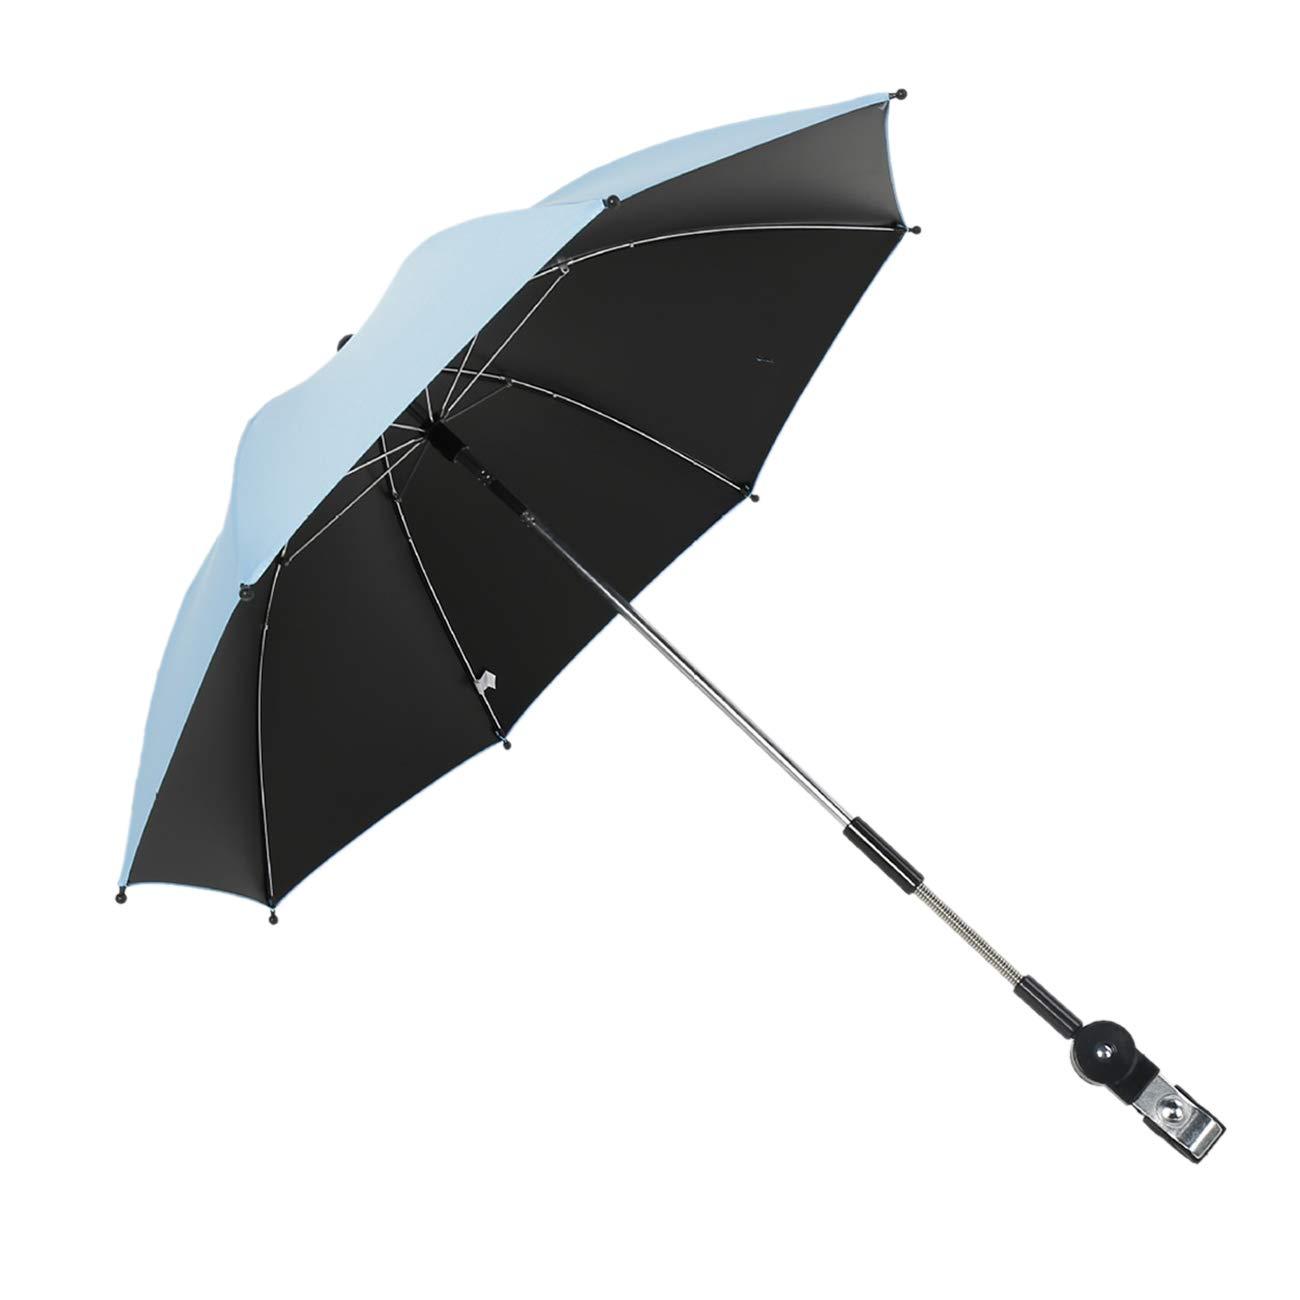 ShiyiUP Wheelchair Pushchair Baby Stroller Parasol Rain Sun Canopy Stretchable Pram Stroller Umbrella Holder Clip Clamp